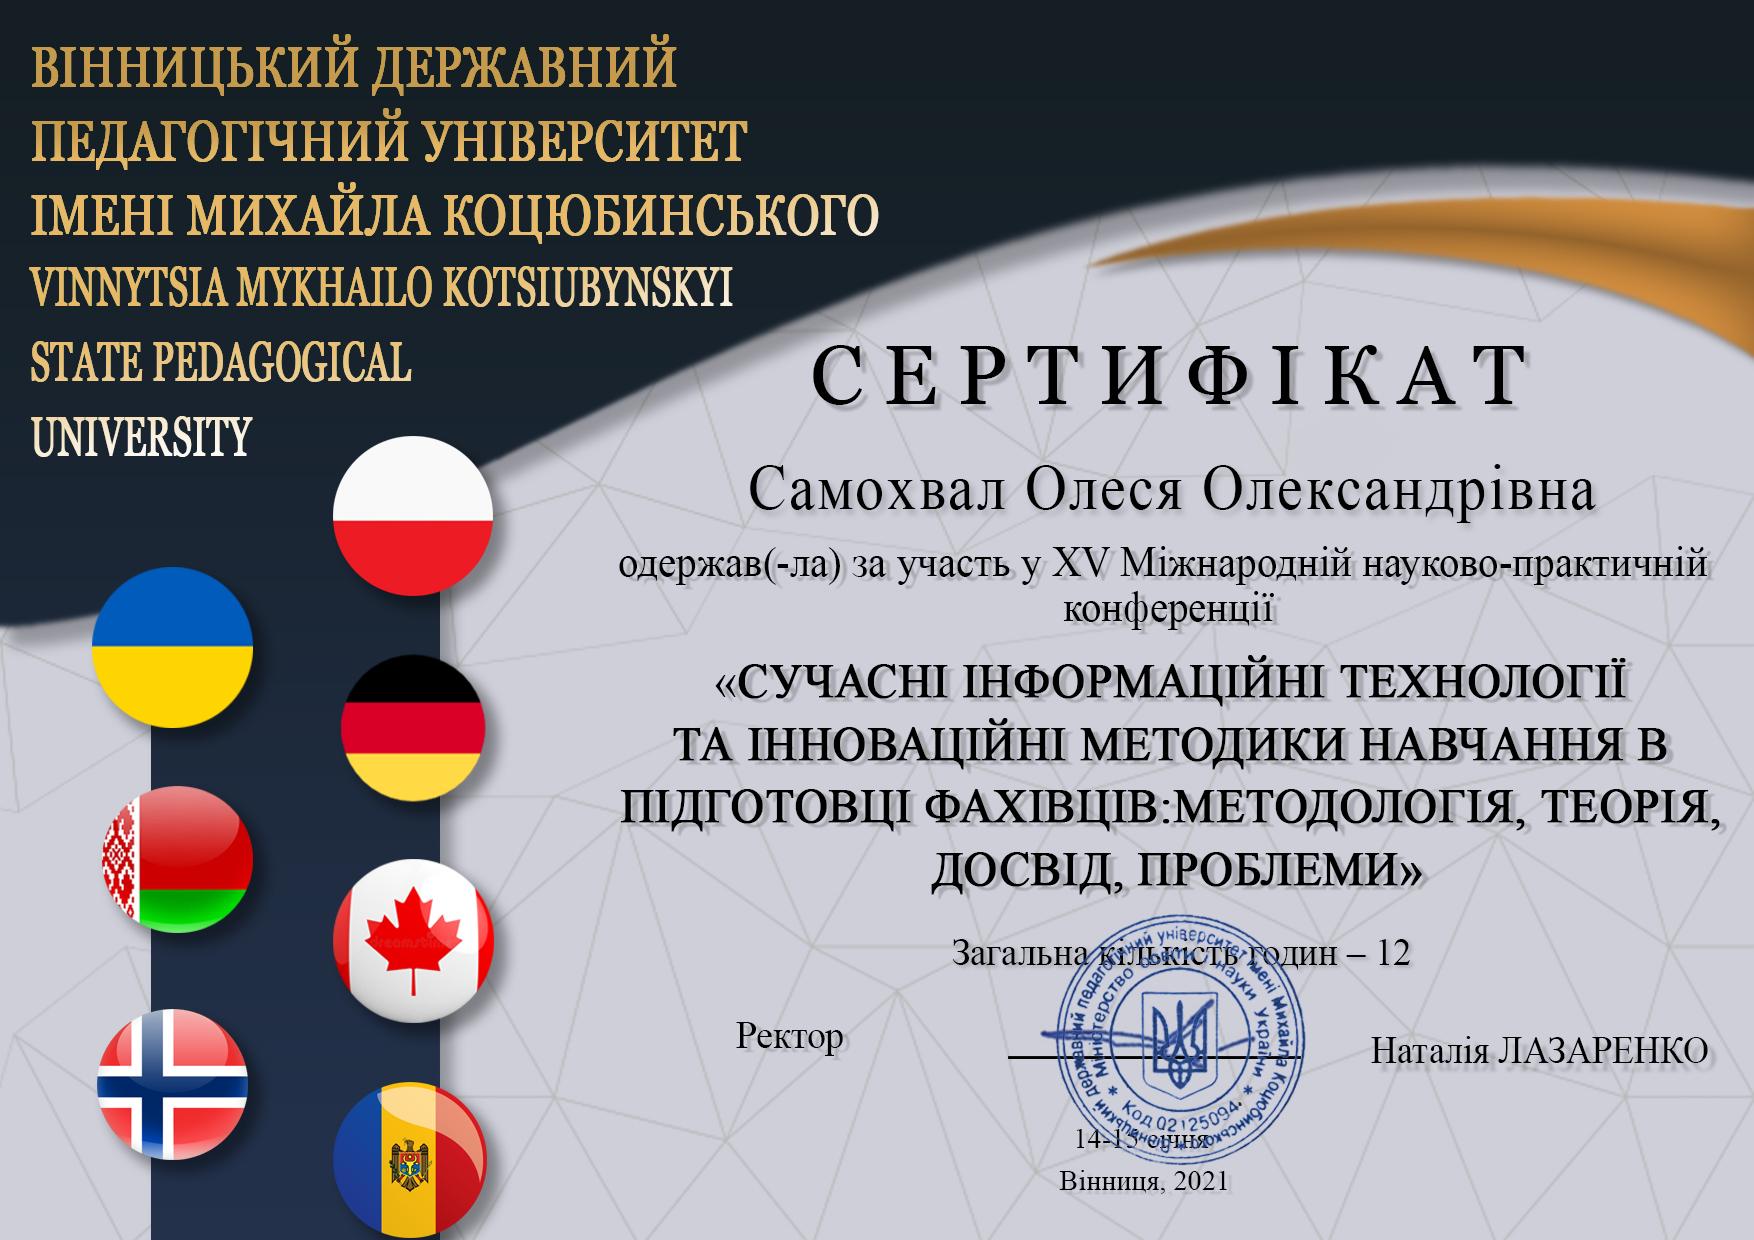 Самохвал Олеся Олександрівна